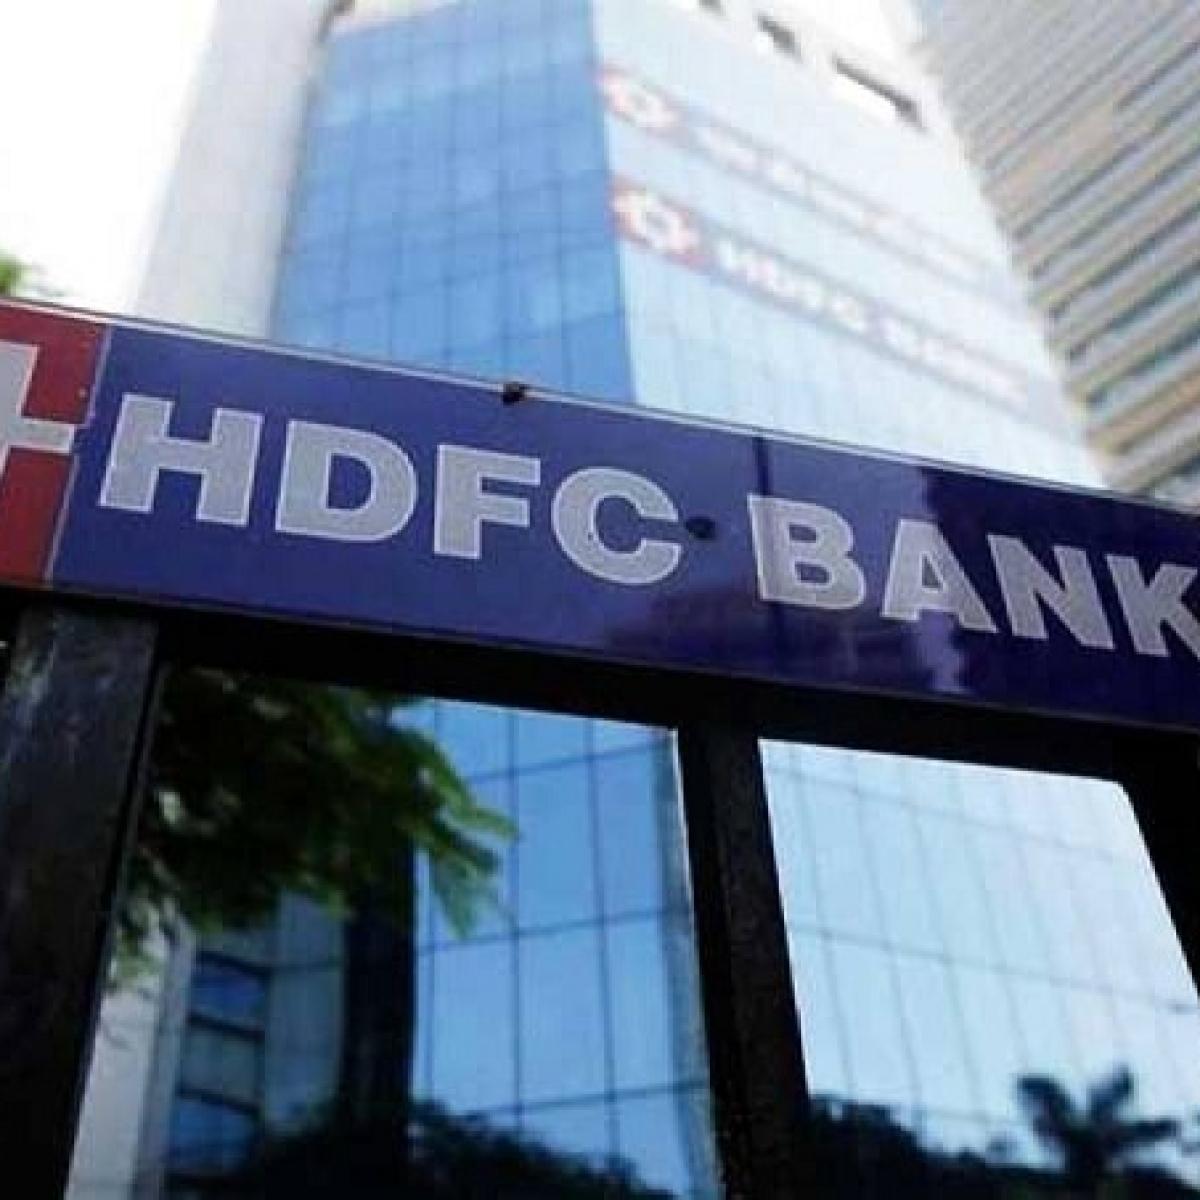 HDFC Bank Q3 net profit rises 14.36% to Rs 8,760 cr